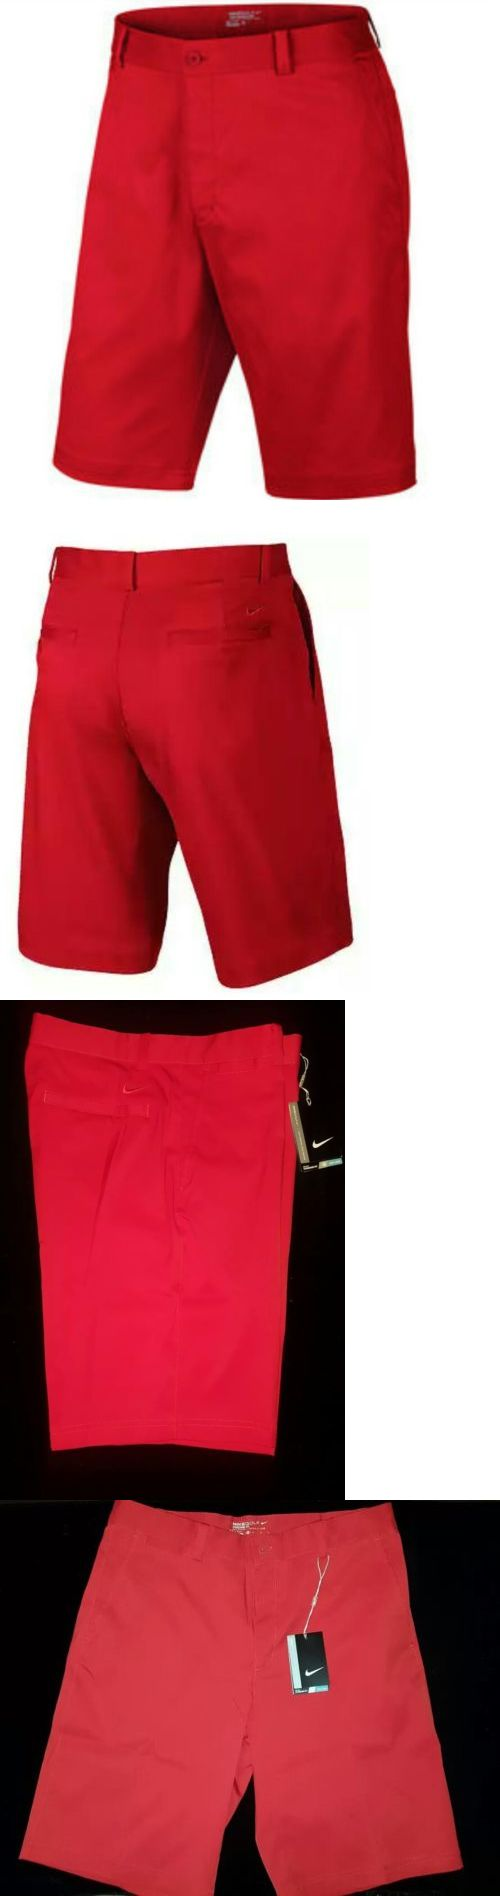 Shorts 181139: Nike Men Dri-Fit Flat Front Standard Fit University Red Short #639798 657 - 32 -> BUY IT NOW ONLY: $35 on eBay!